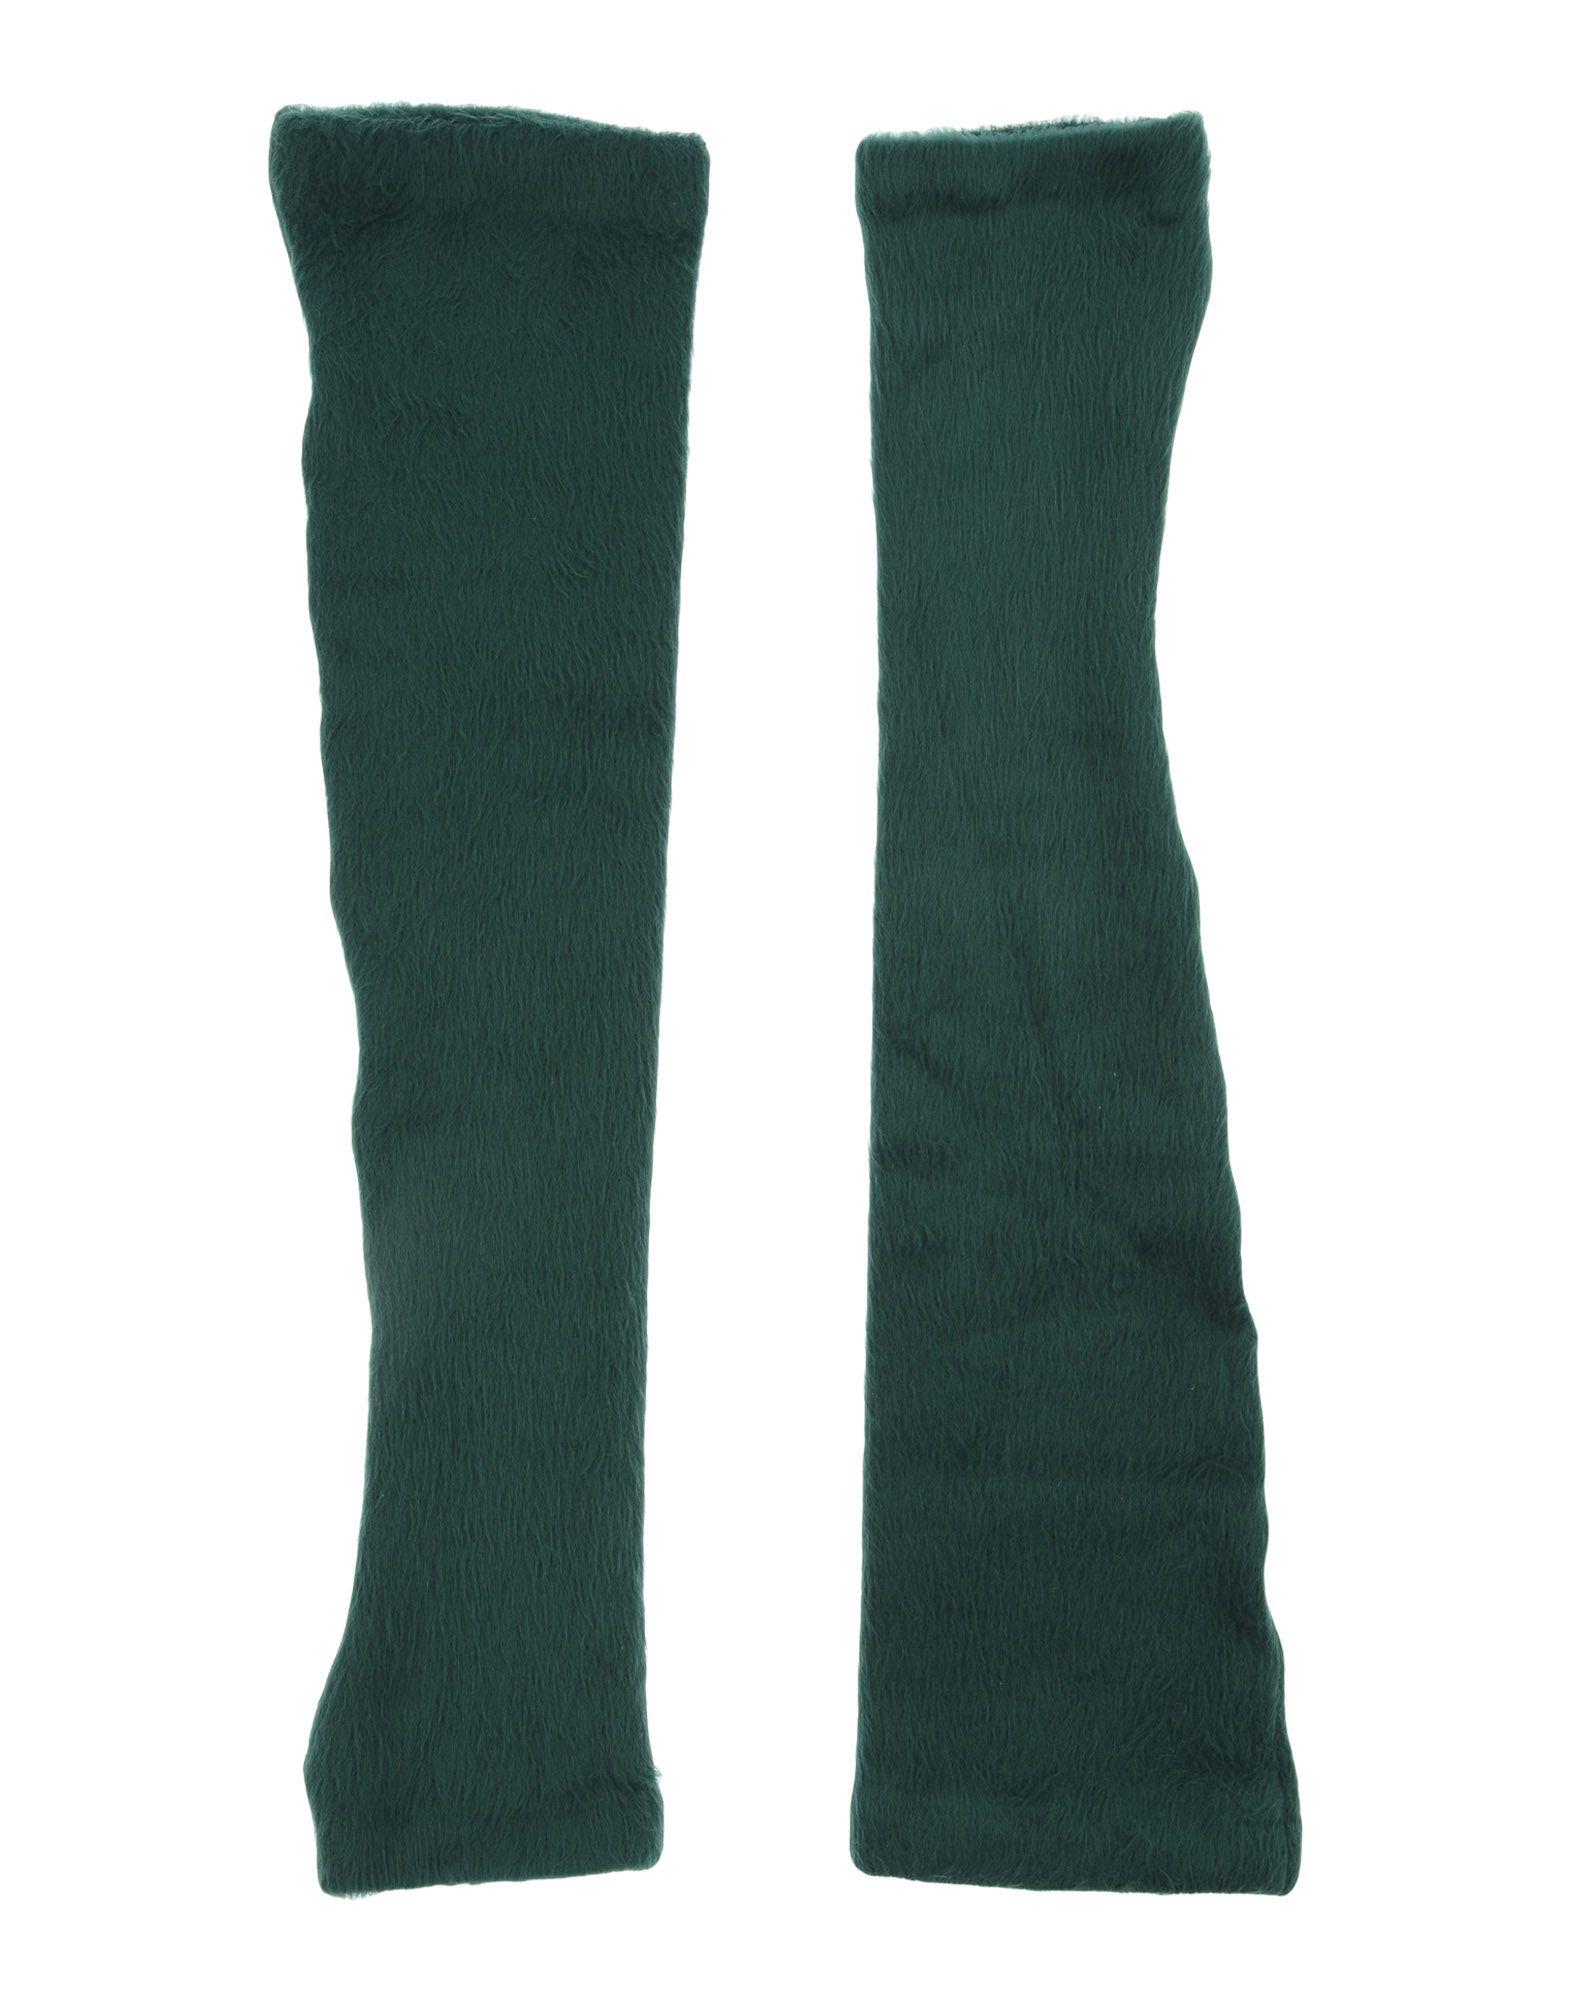 1-ONE Damen Handschuhe Farbe Grün Größe 1